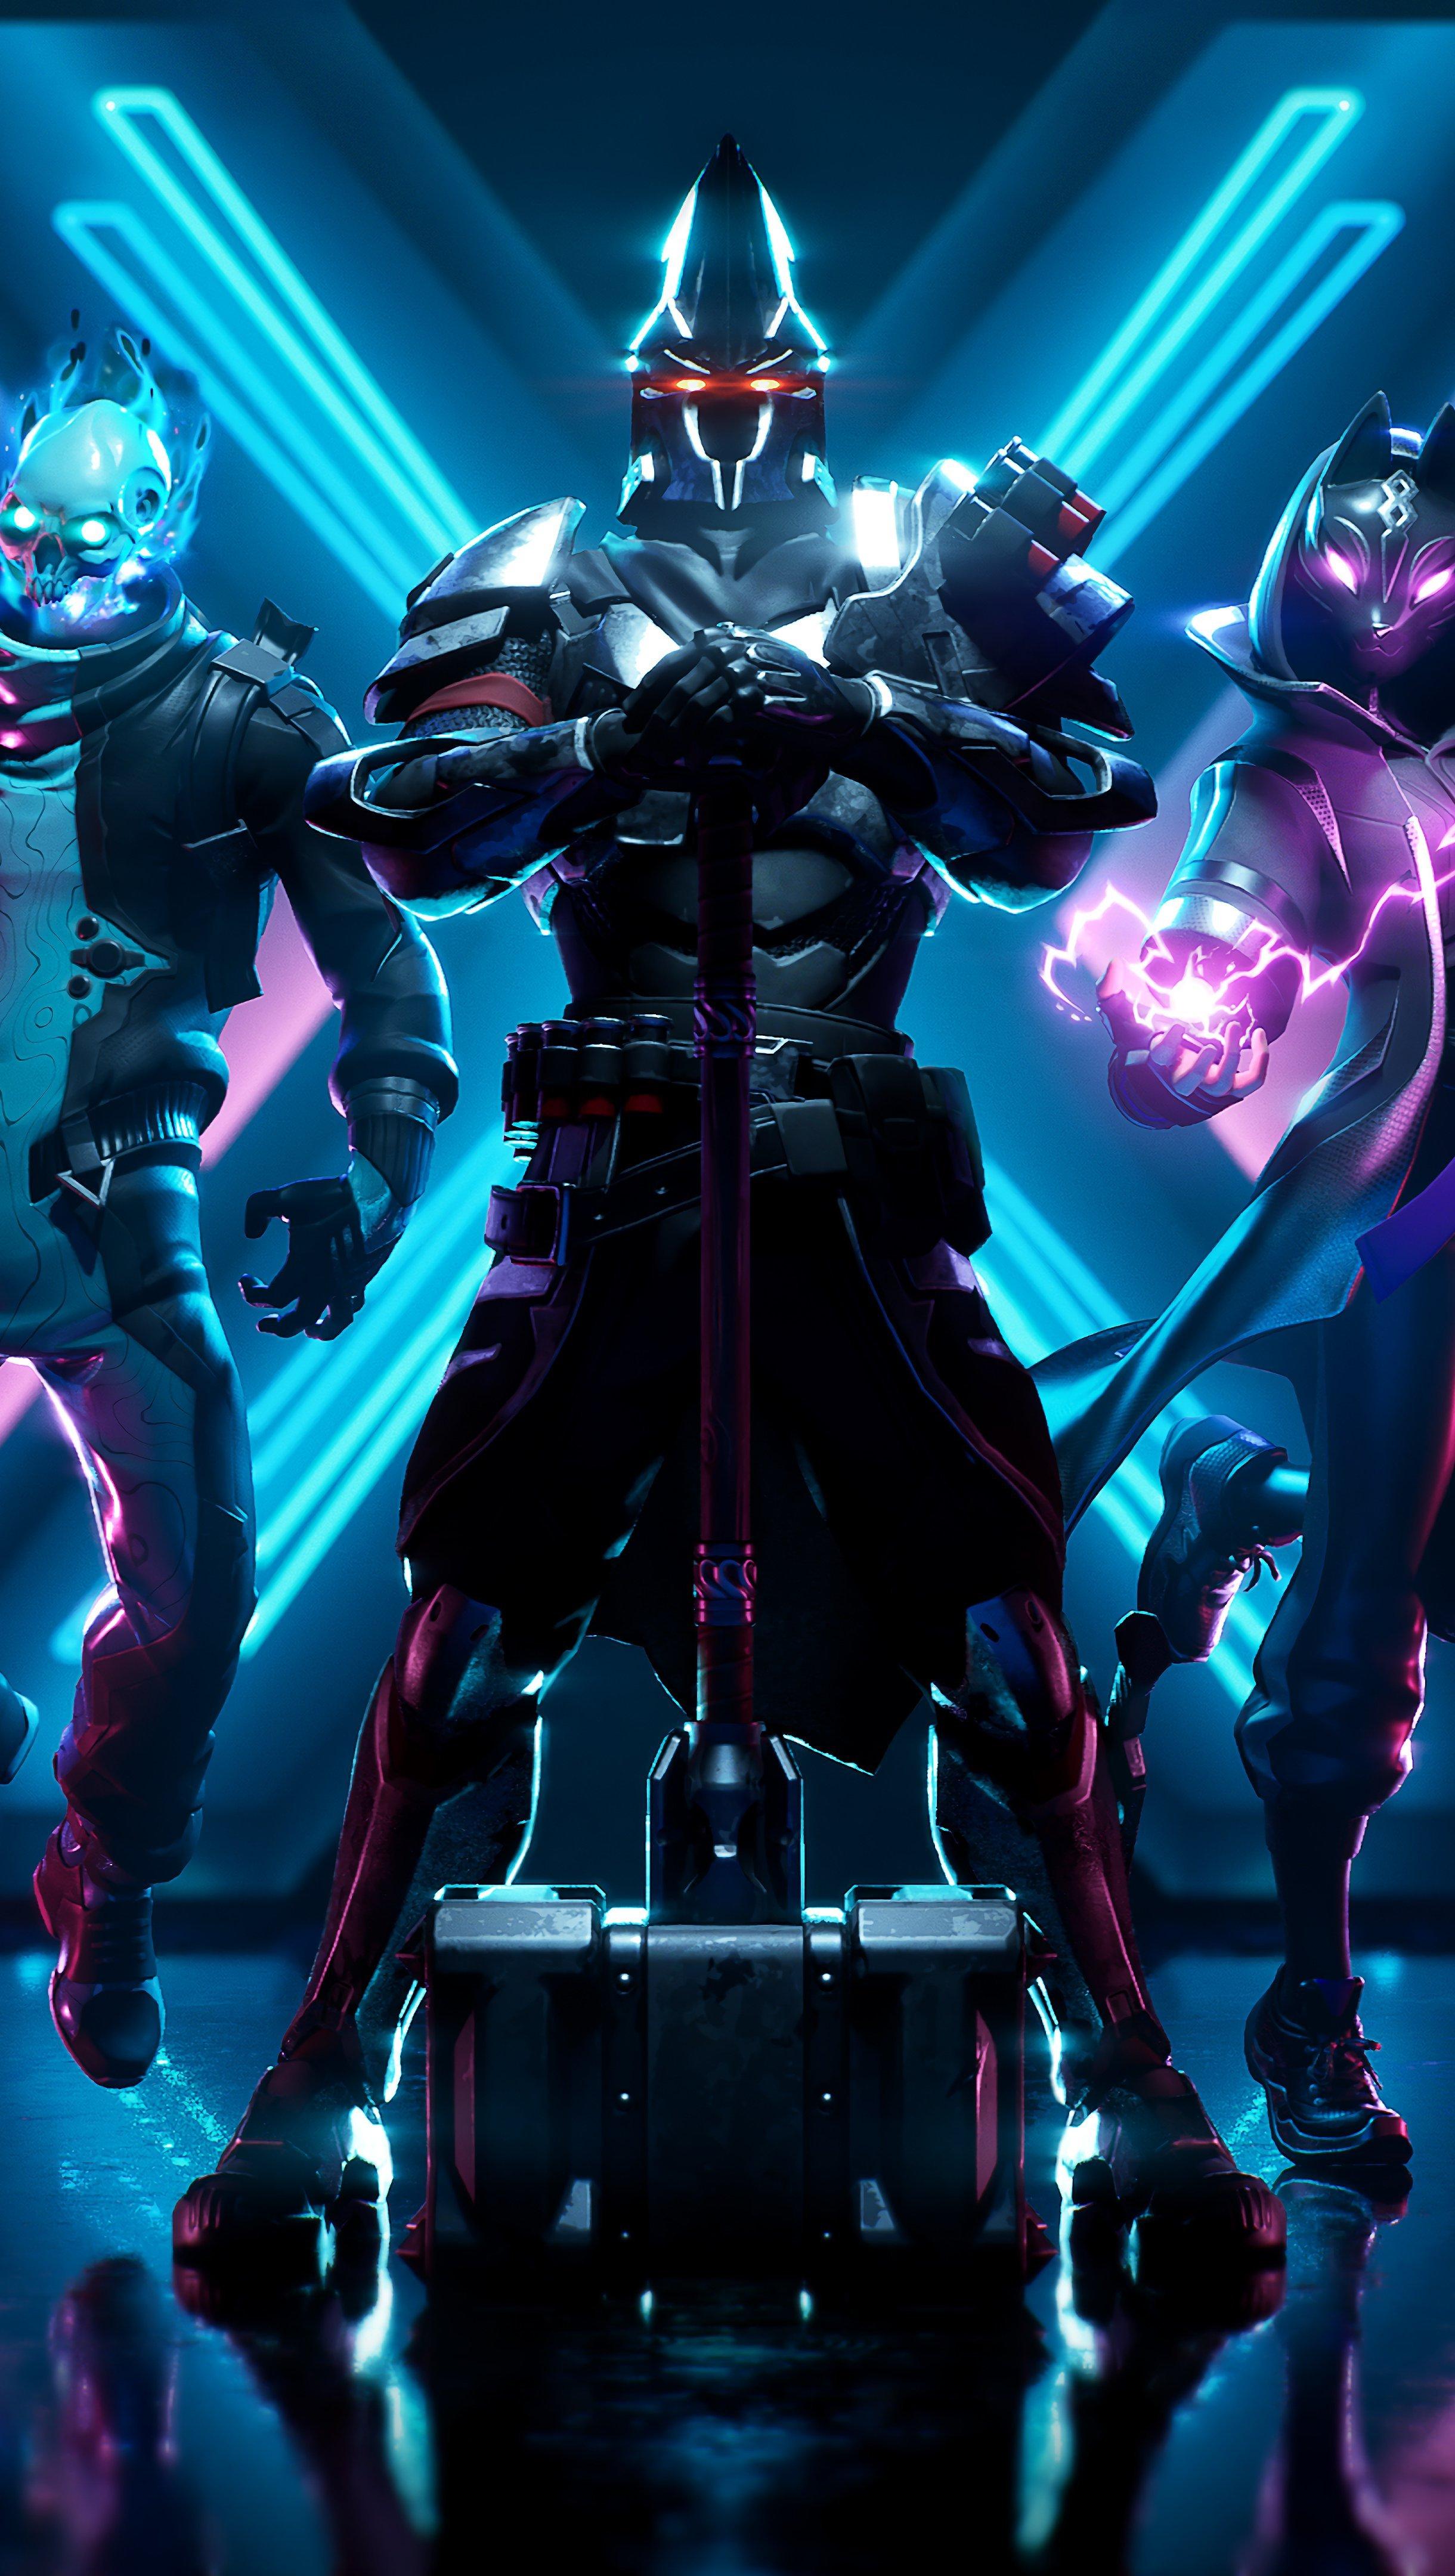 Fondos de pantalla Fortnite X Todos los trajes de Battle Pass Skins Season 10 Vertical